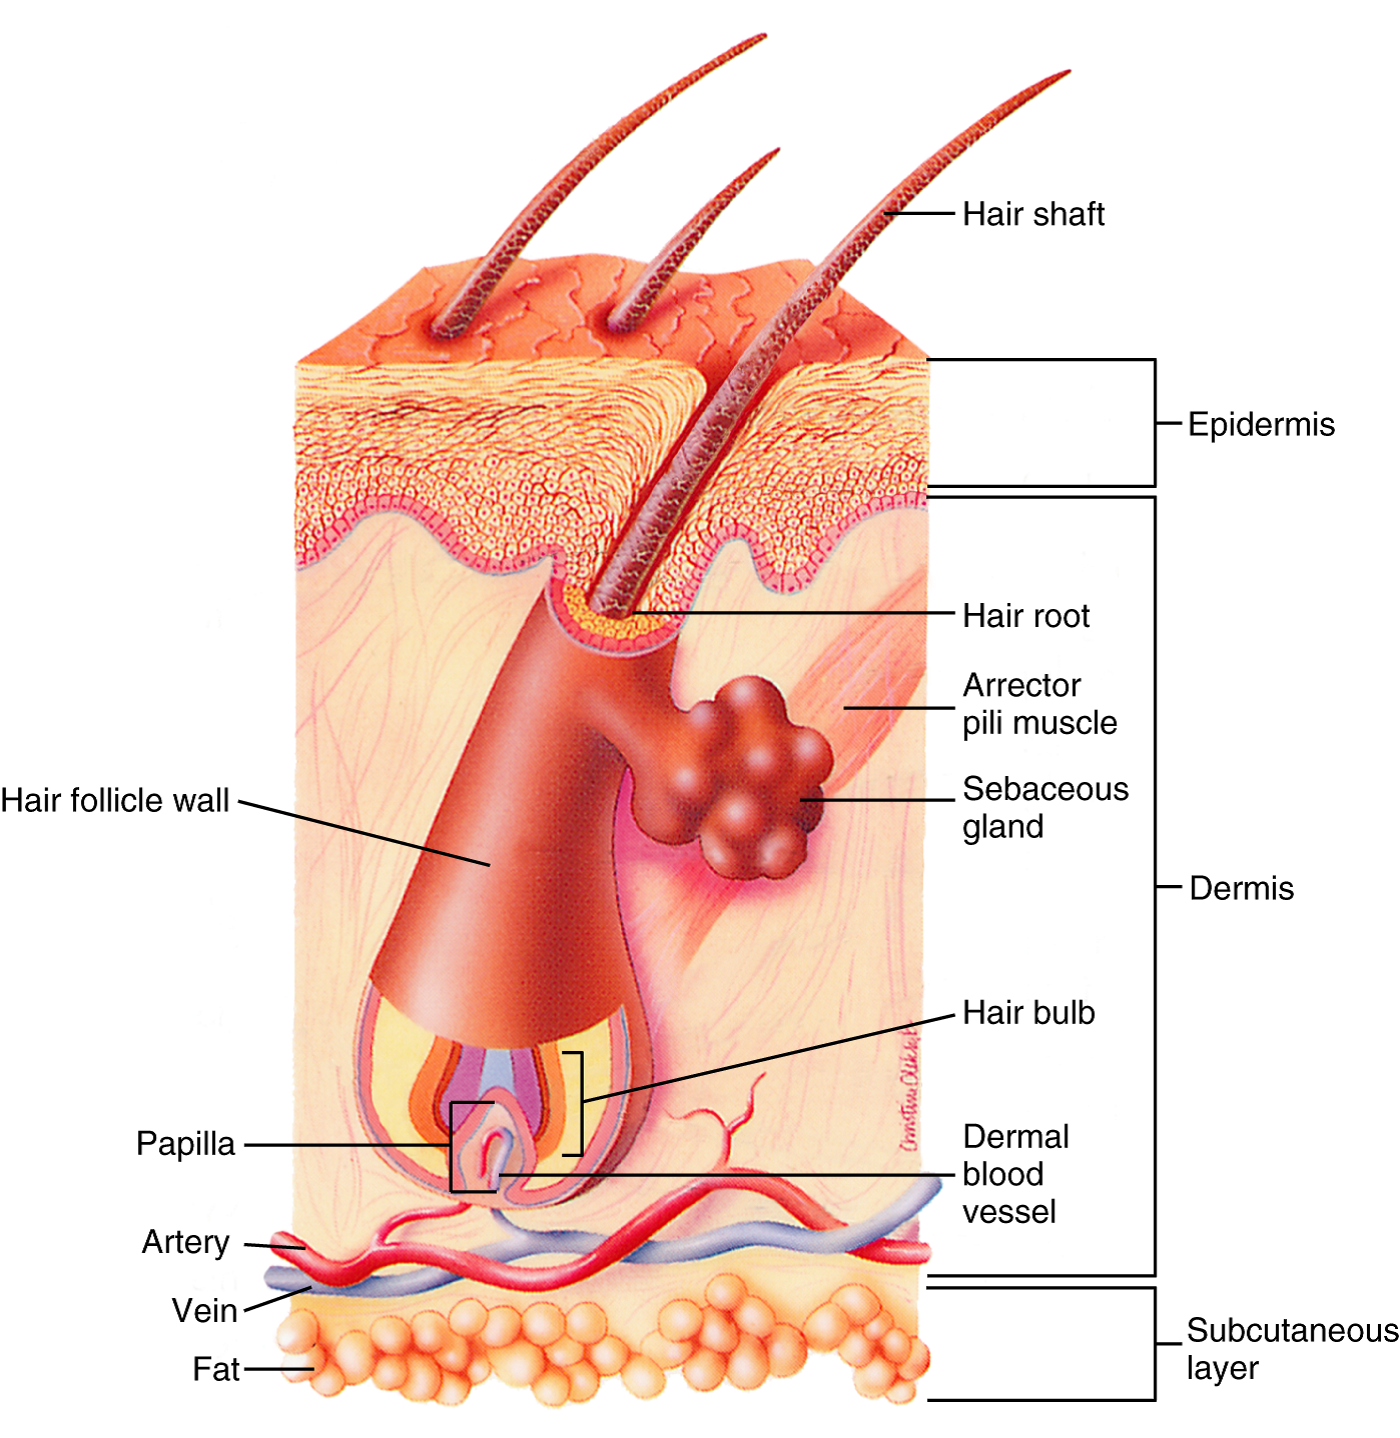 hair follicle tubelike structure